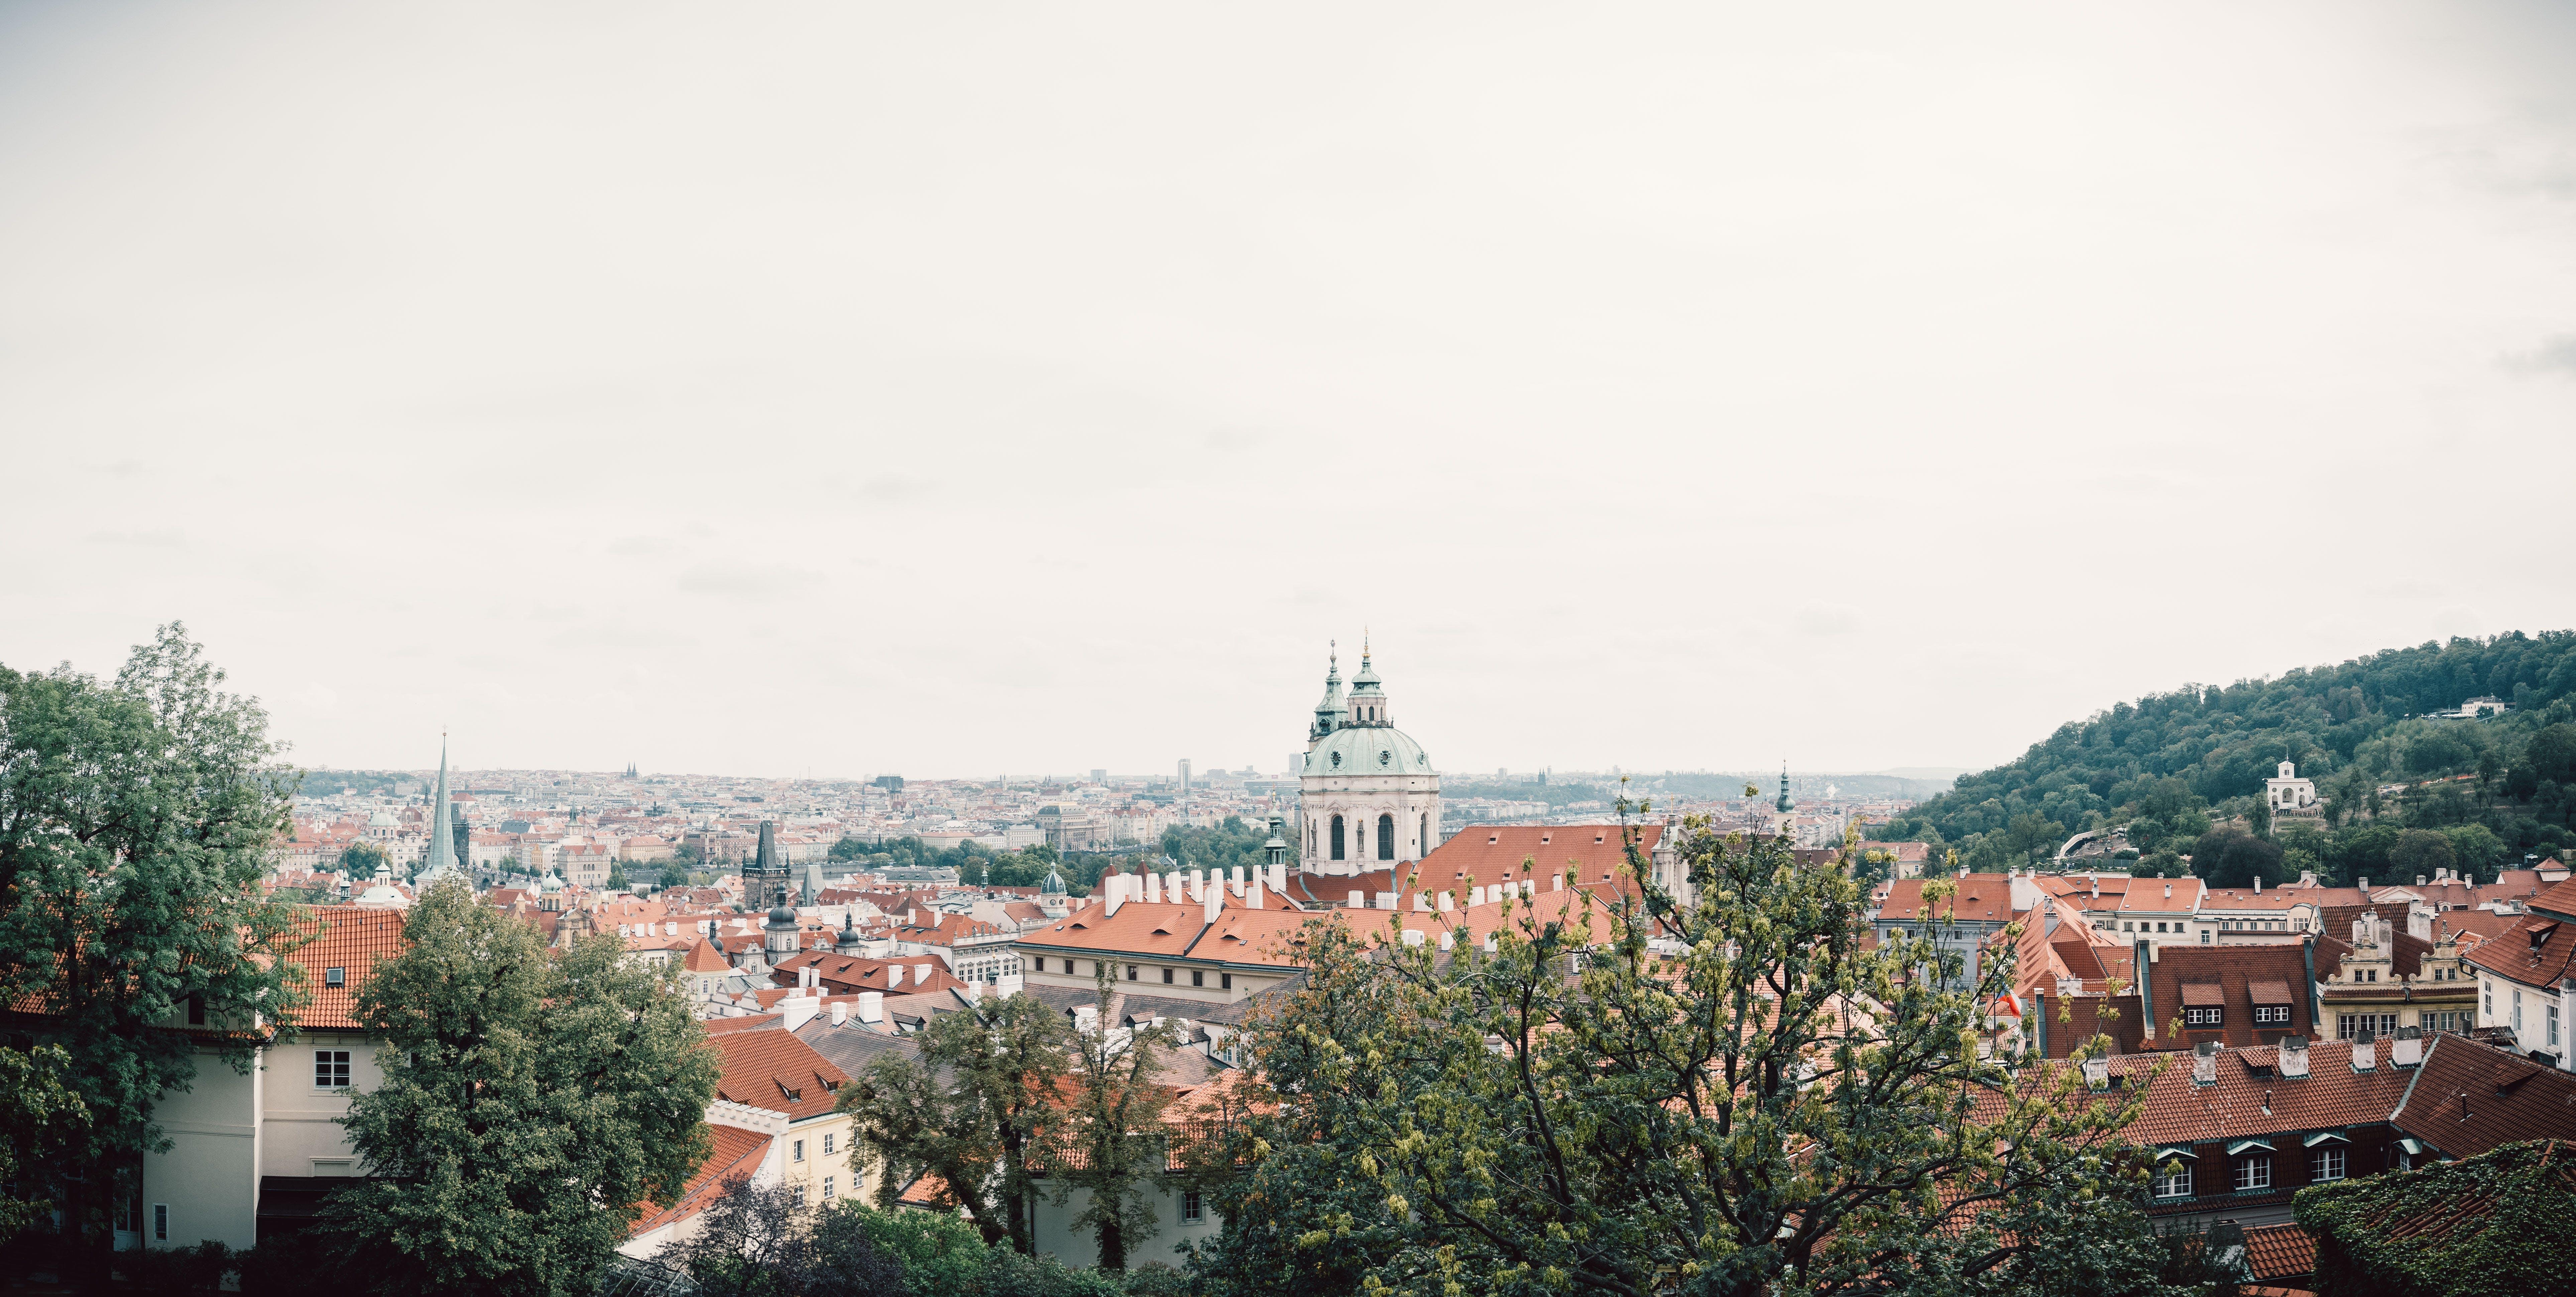 Panoramic Shot Of Town